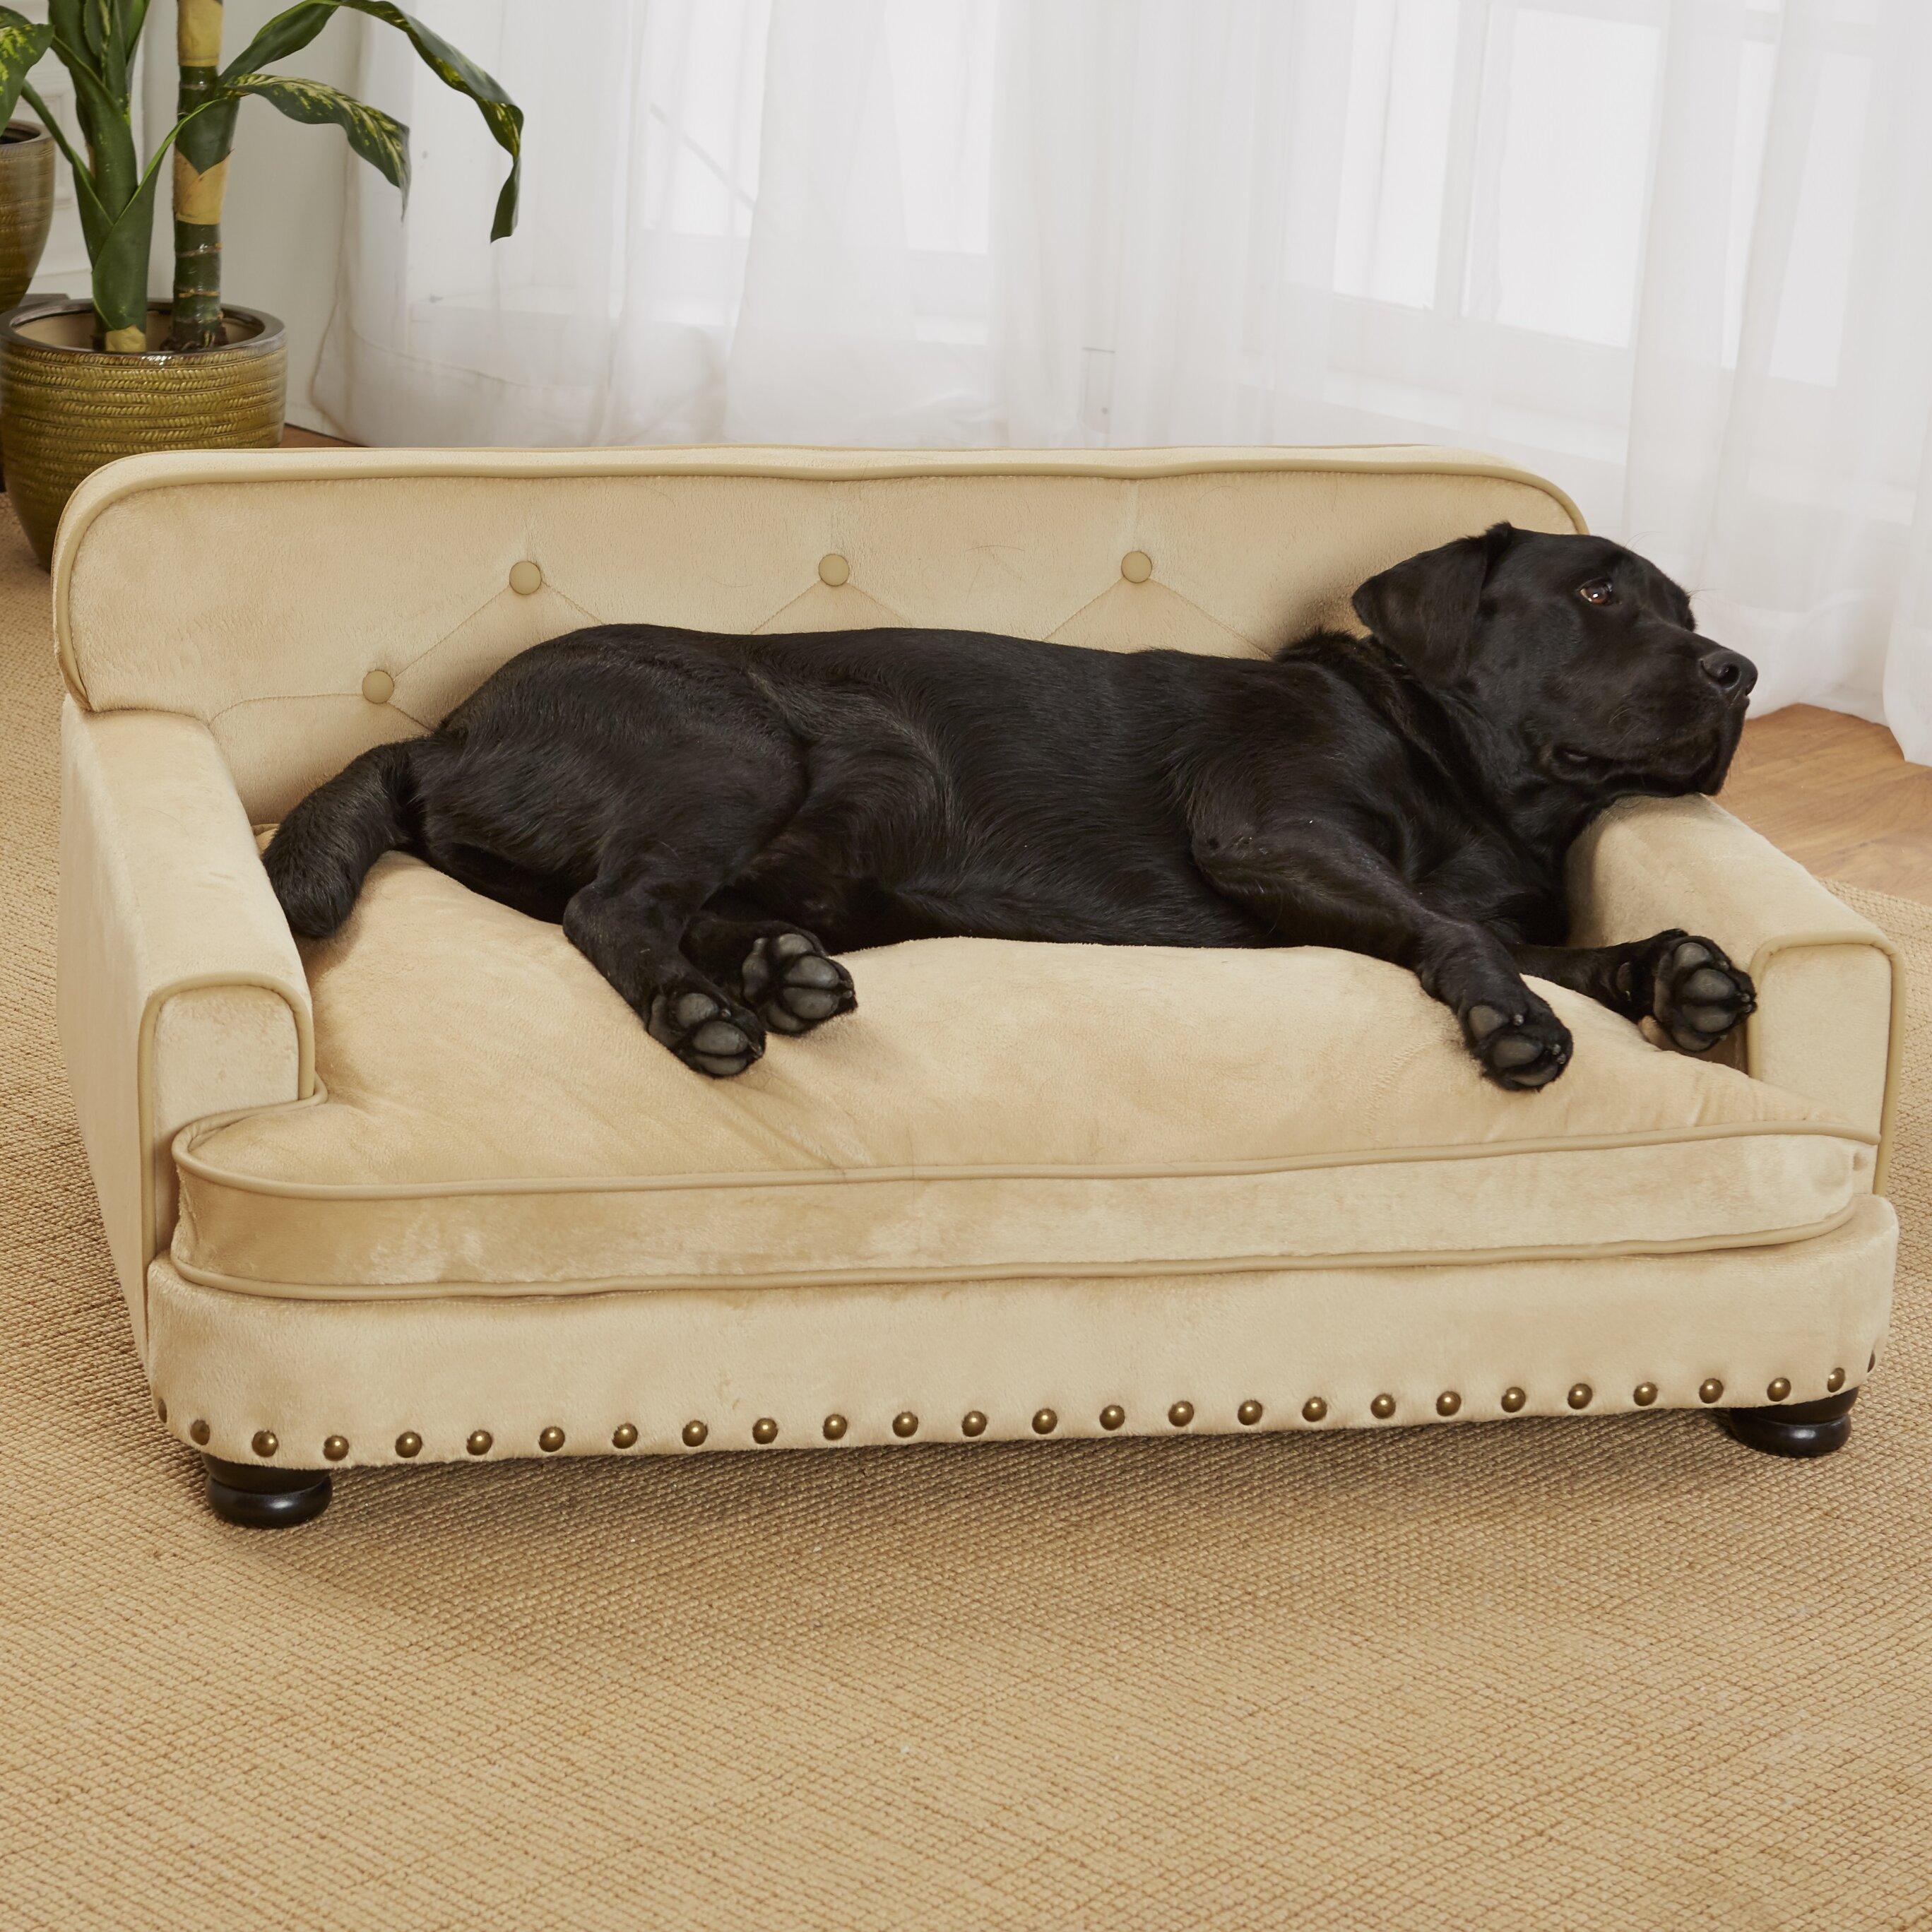 Enchanted Home Pet Library Dog Sofa Reviews Wayfair